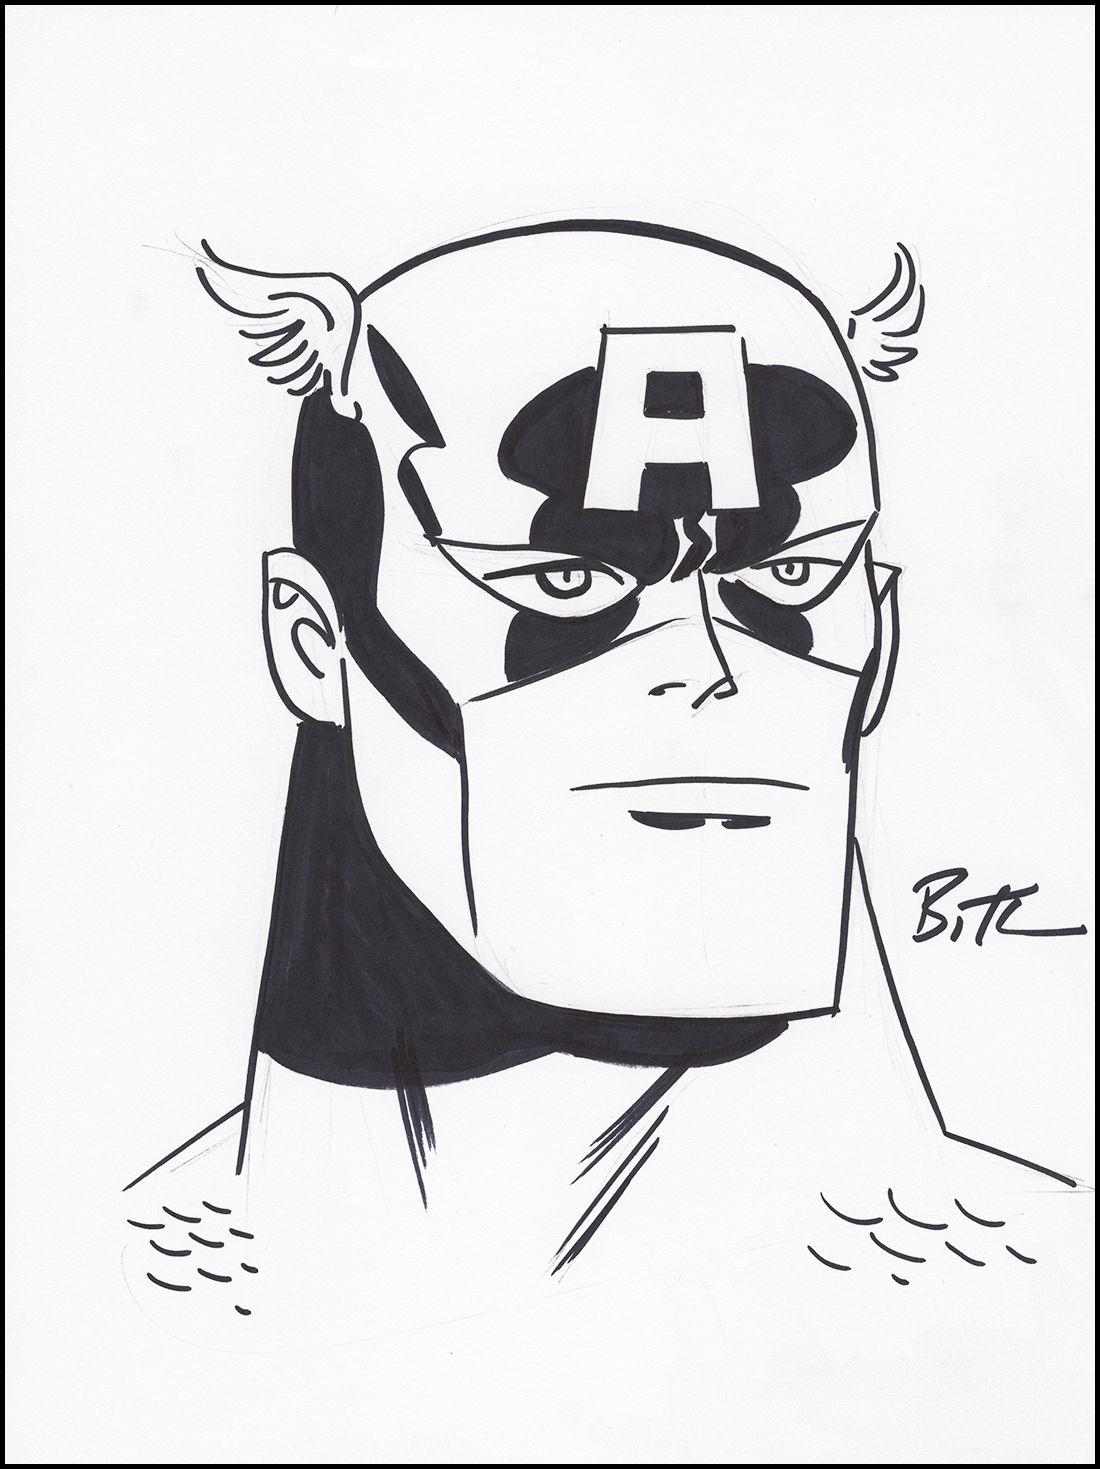 1100x1469 Art Bruce Timm Original Captain America Pencil Amp Ink Drawing